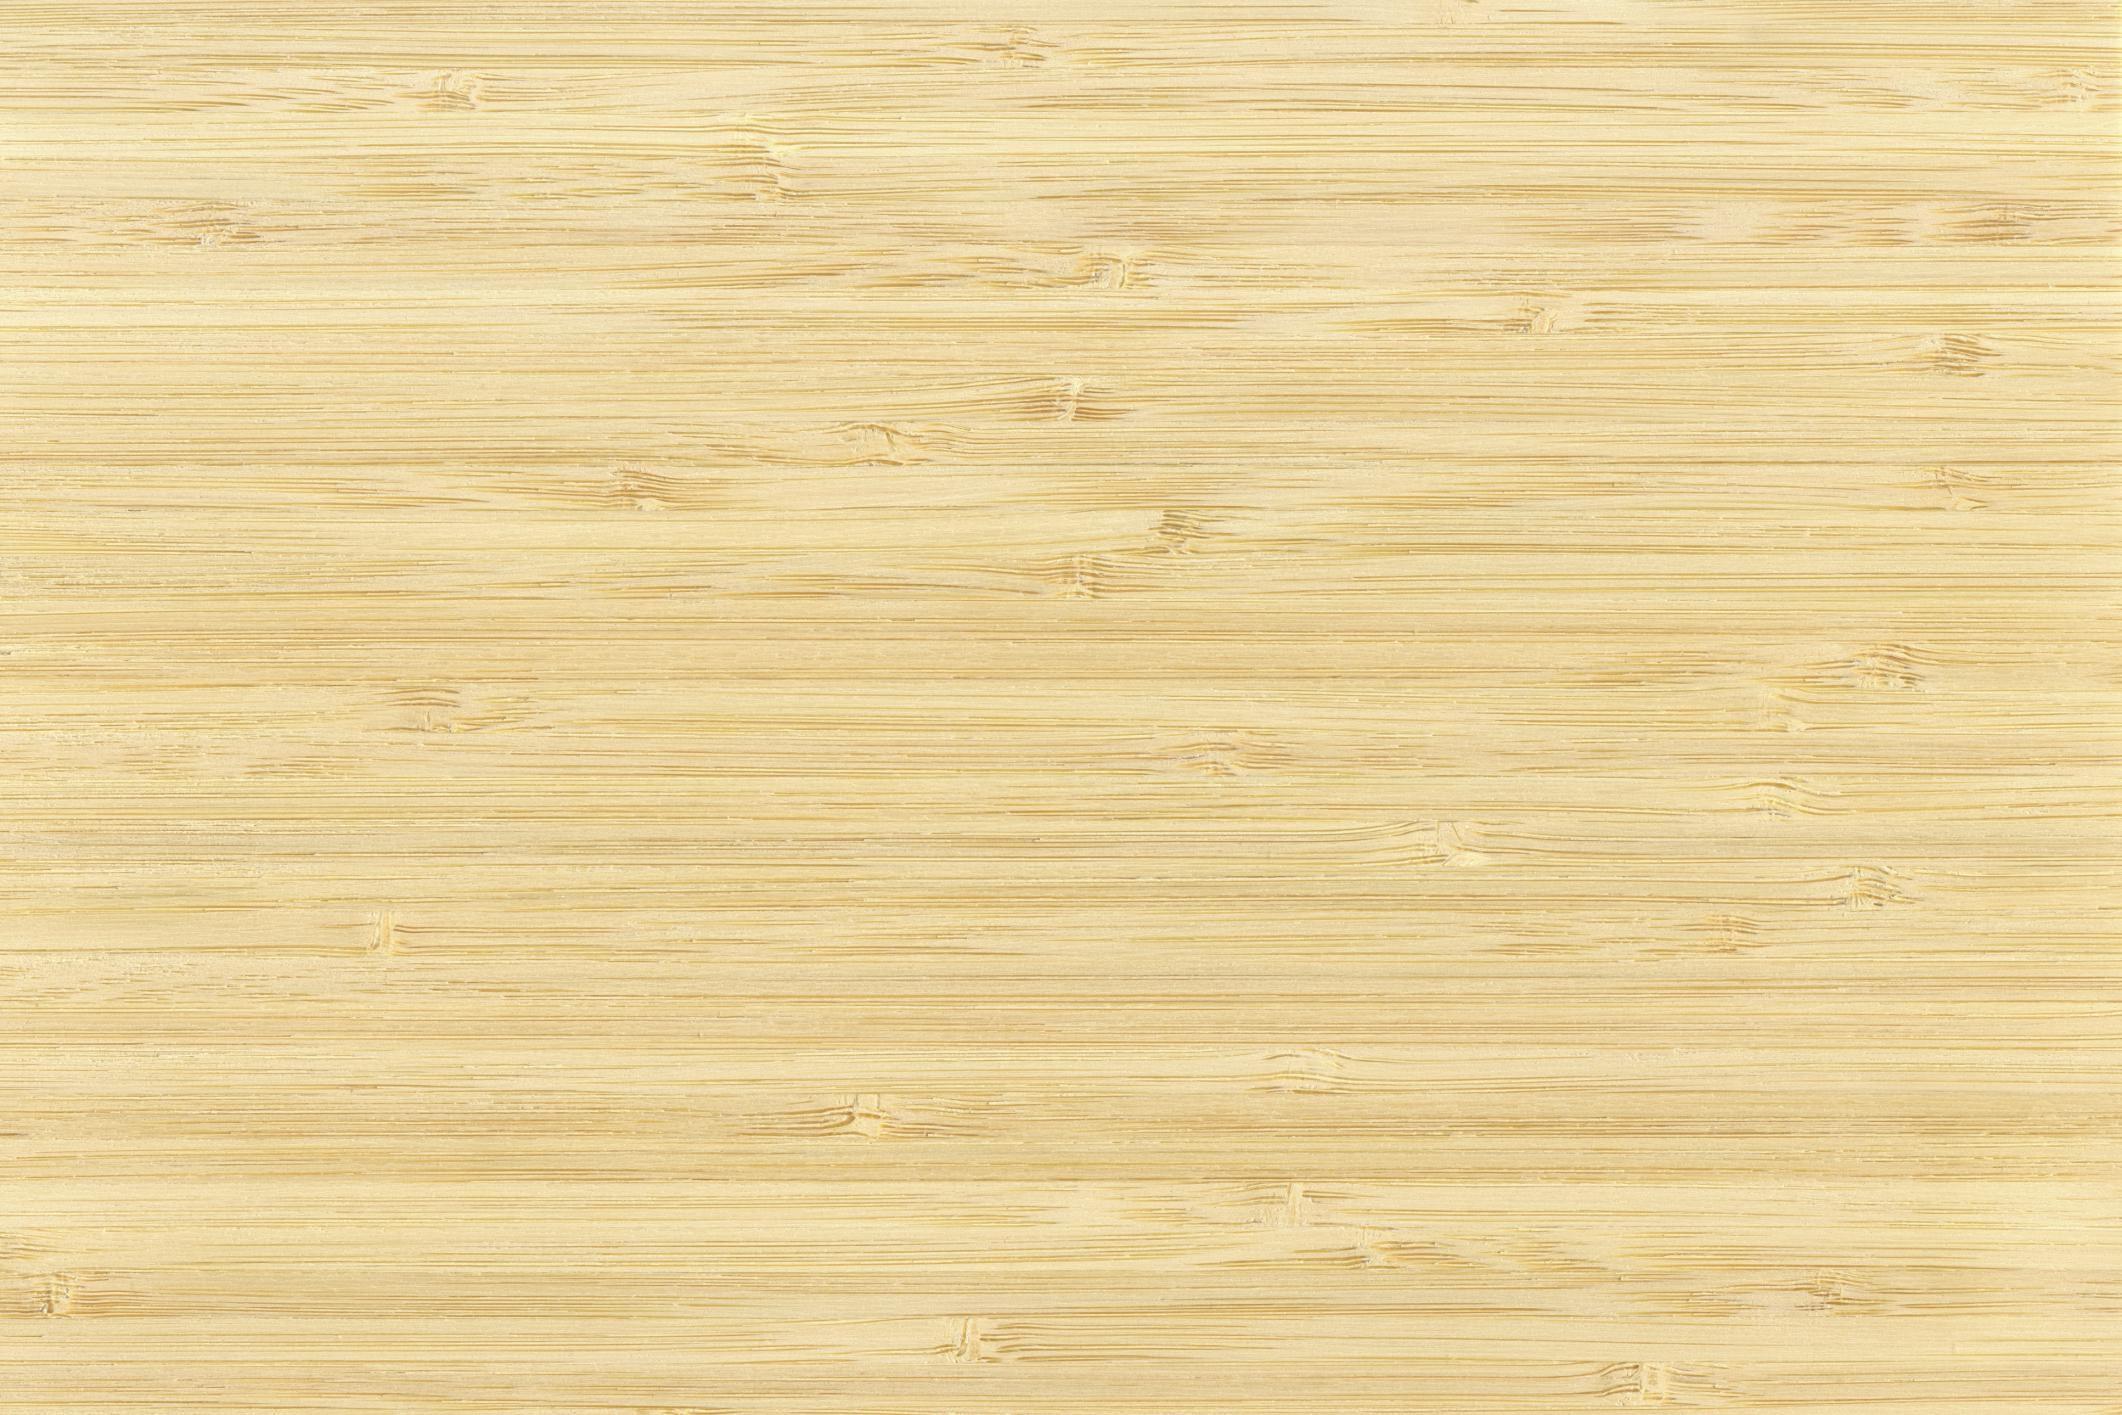 bamboo flooring vs engineered hardwood flooring of bamboo flooring in a bathroom things to consider in 182740579 56a2fd883df78cf7727b6d14